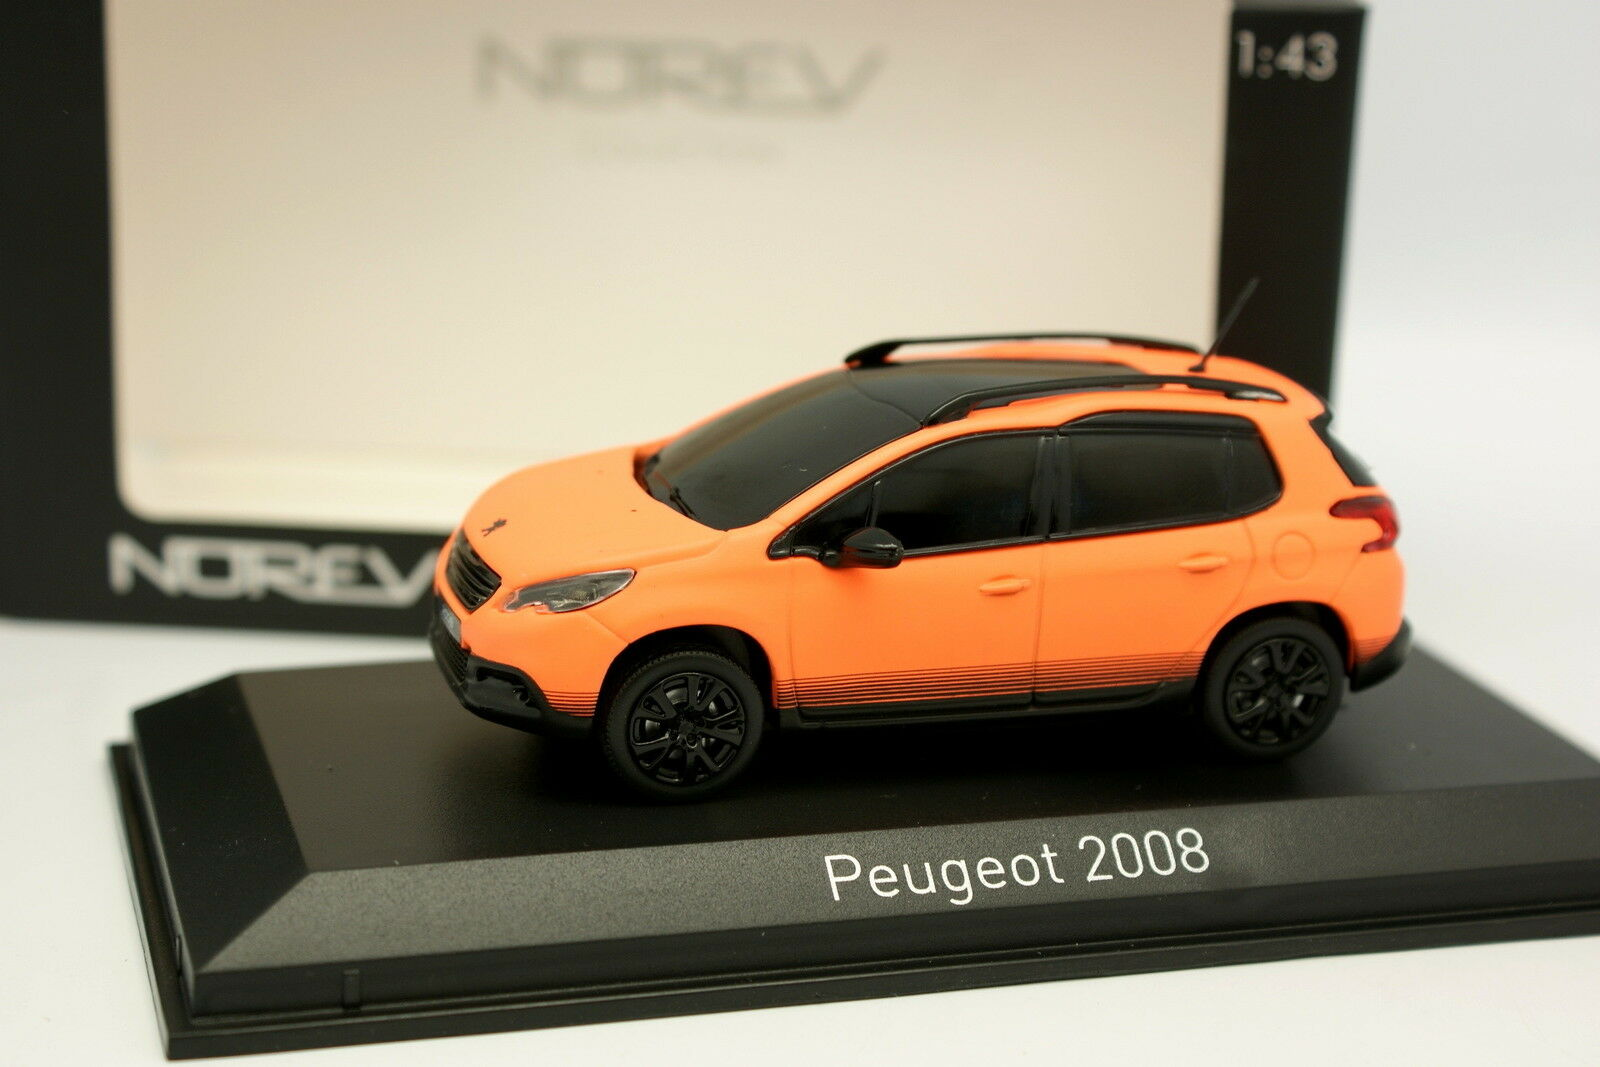 Norev 1 43 - Peugeot 2008 Orange Matt